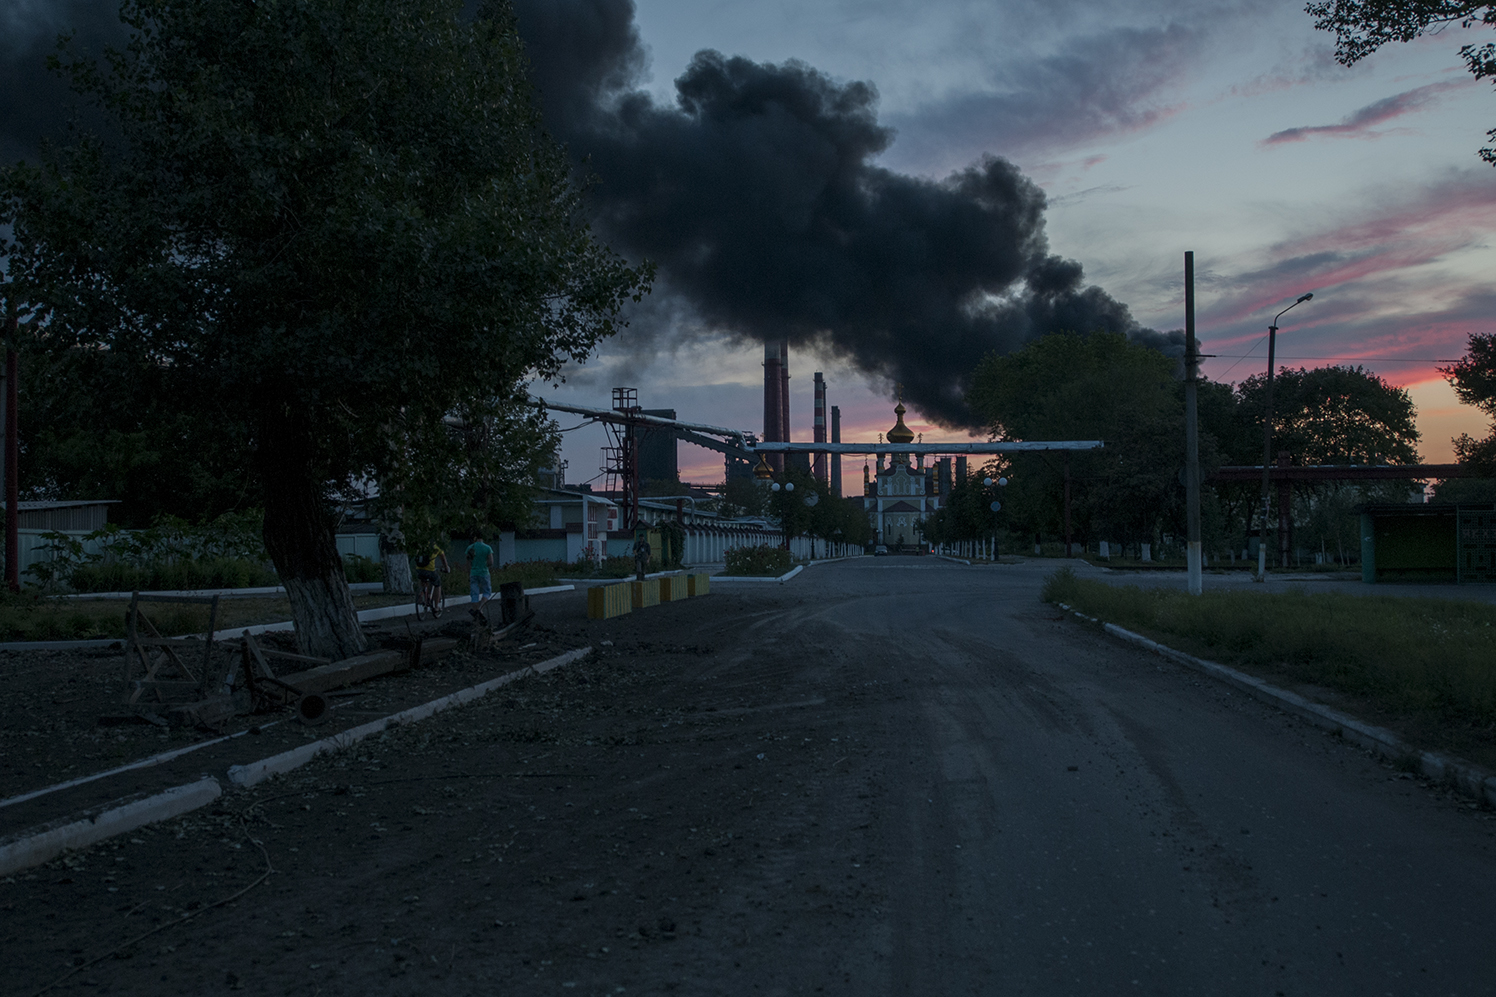 Dark smoke rising over church 19 as the sunset down